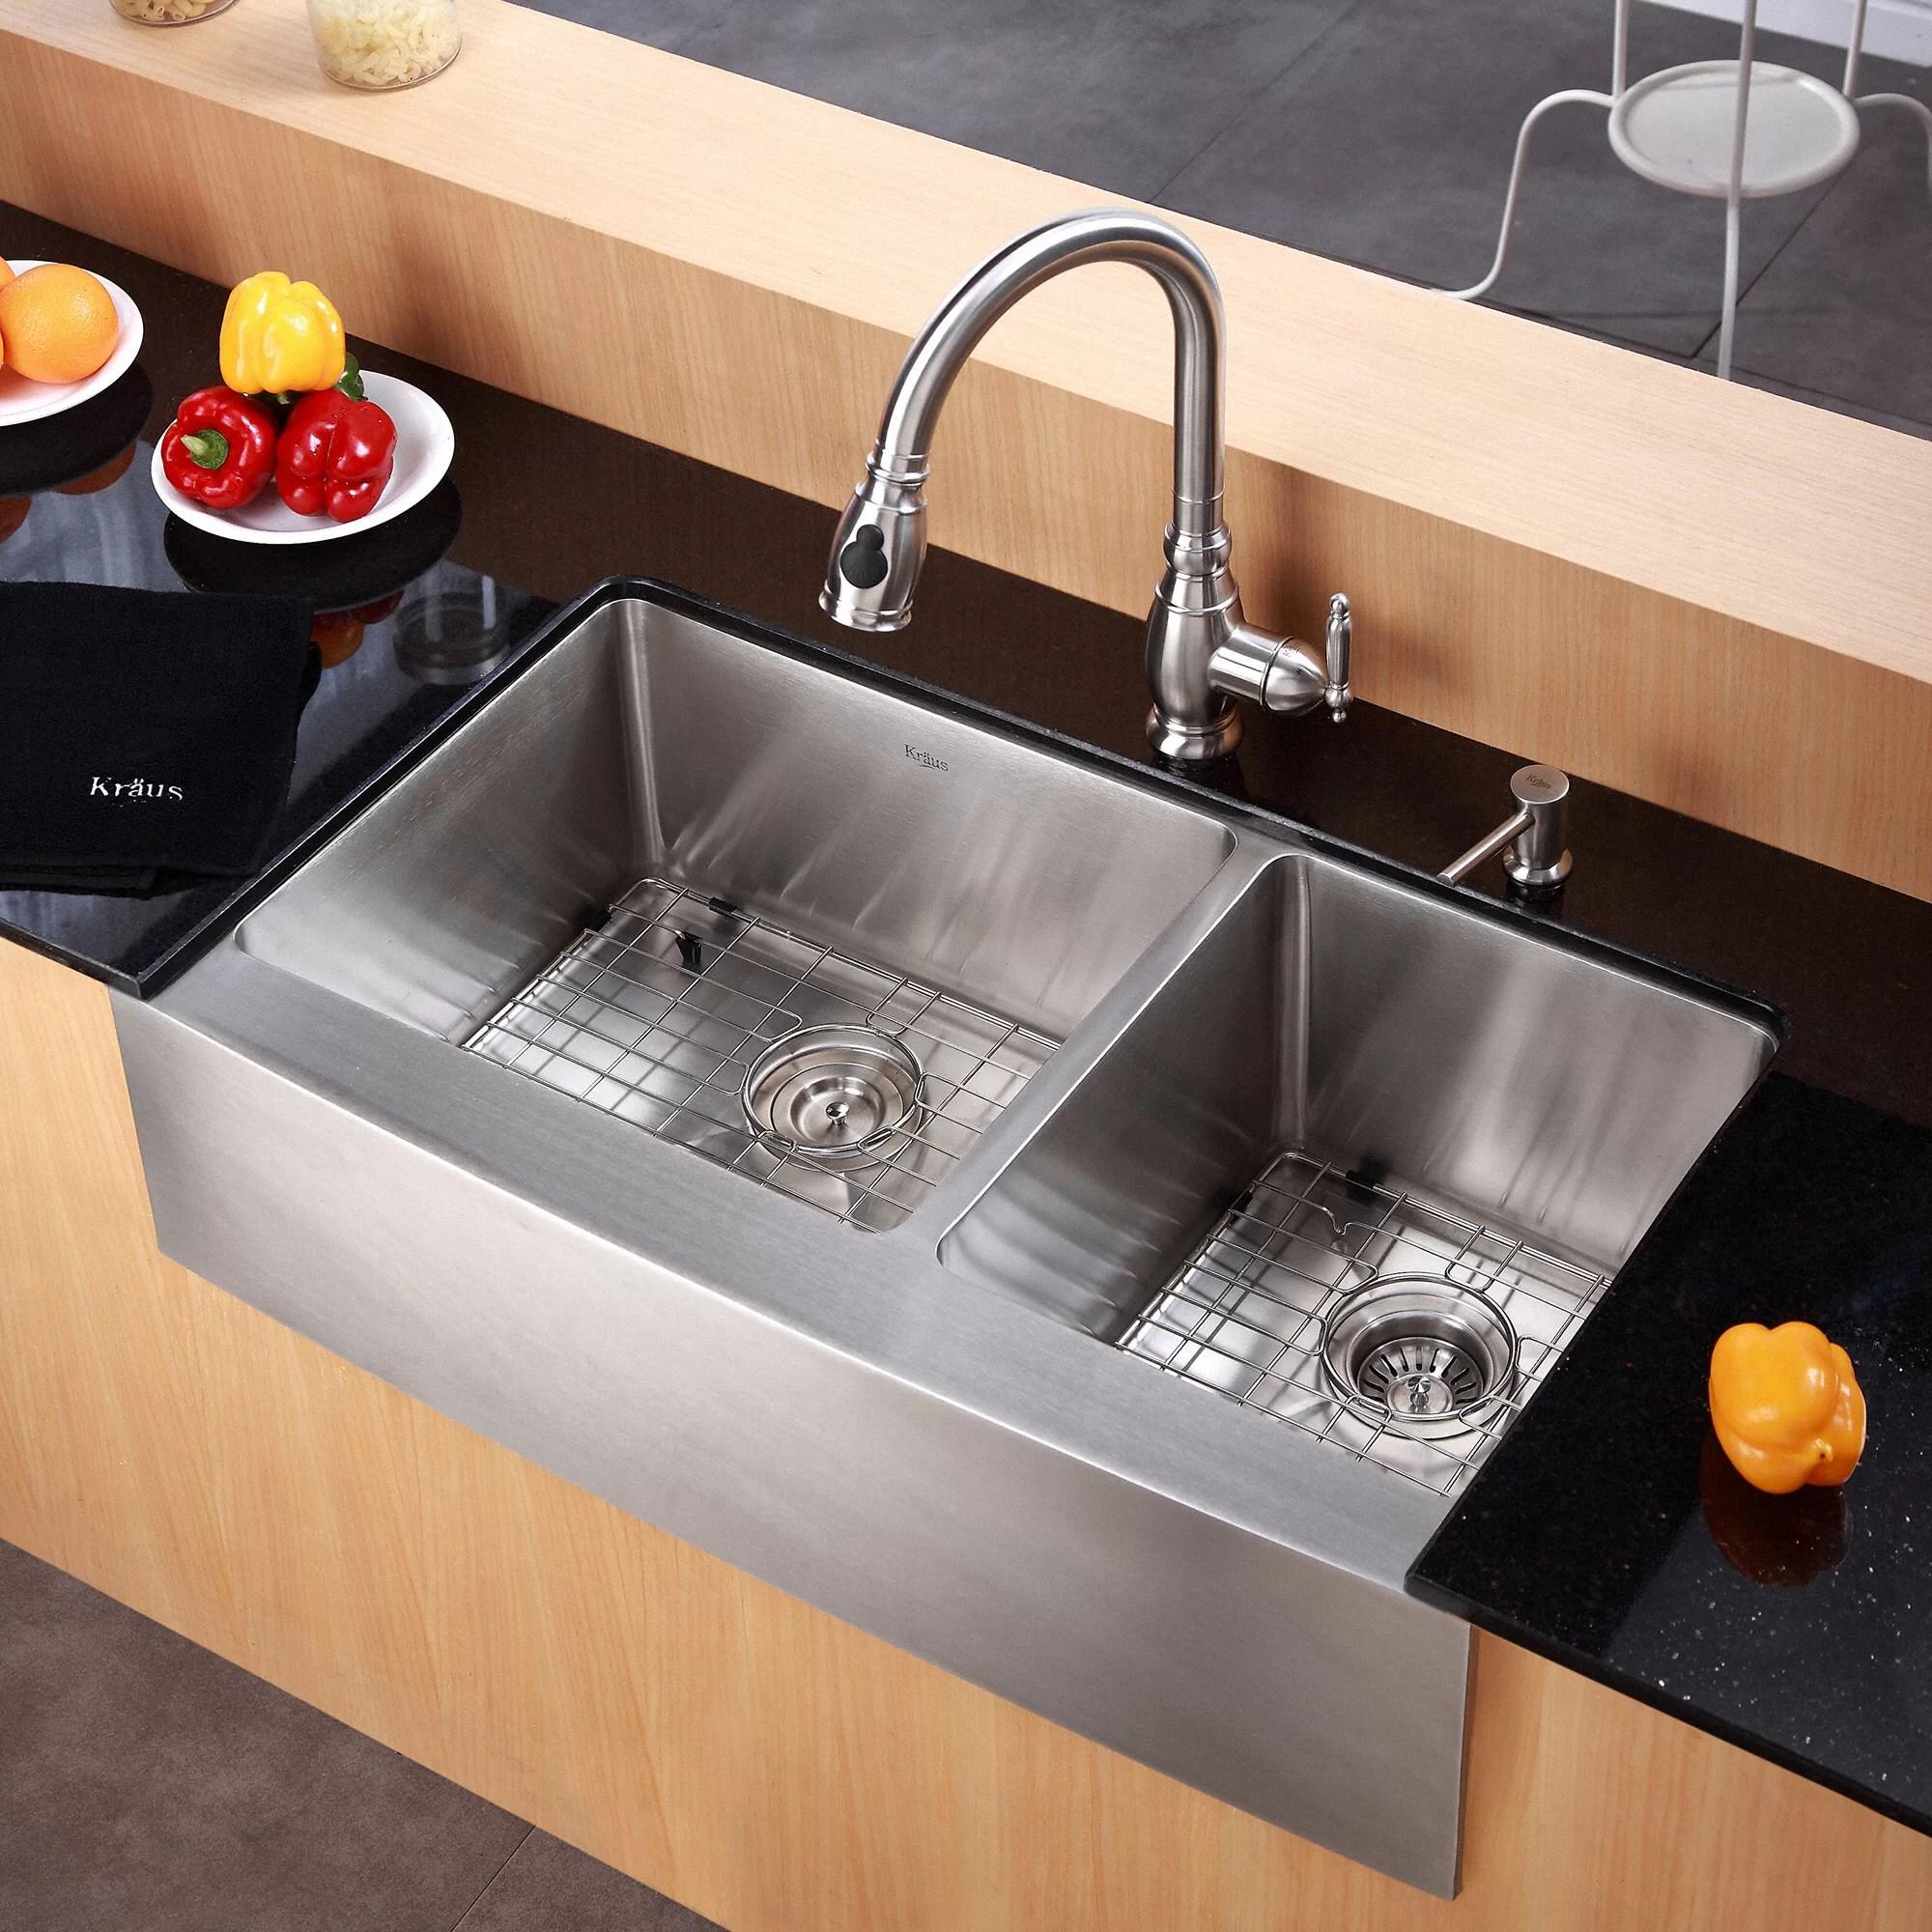 Kraus farmhouse 36quot 60 40 double bowl kitchen sink